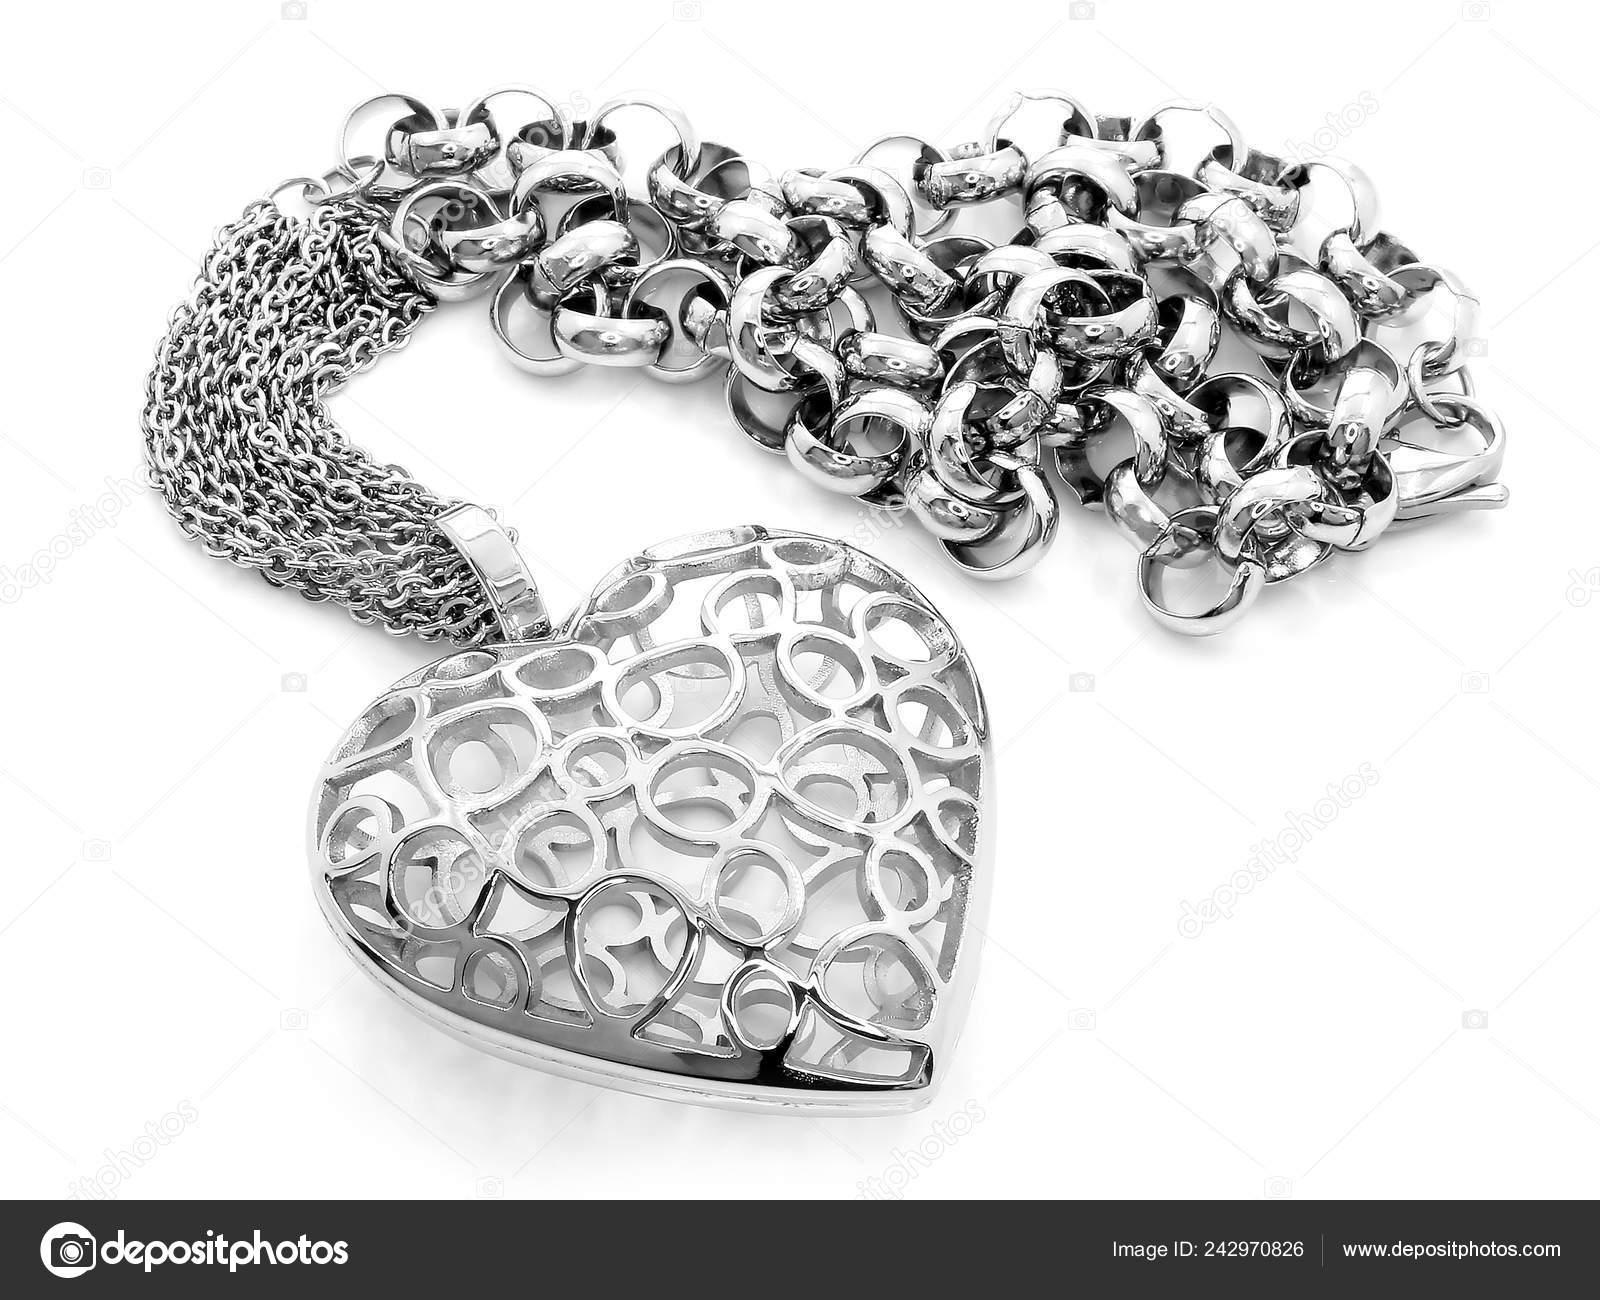 75e625e24652 Joya Plata Collar Corazón Acero Inoxidable Color Fondo Una — Foto de ...